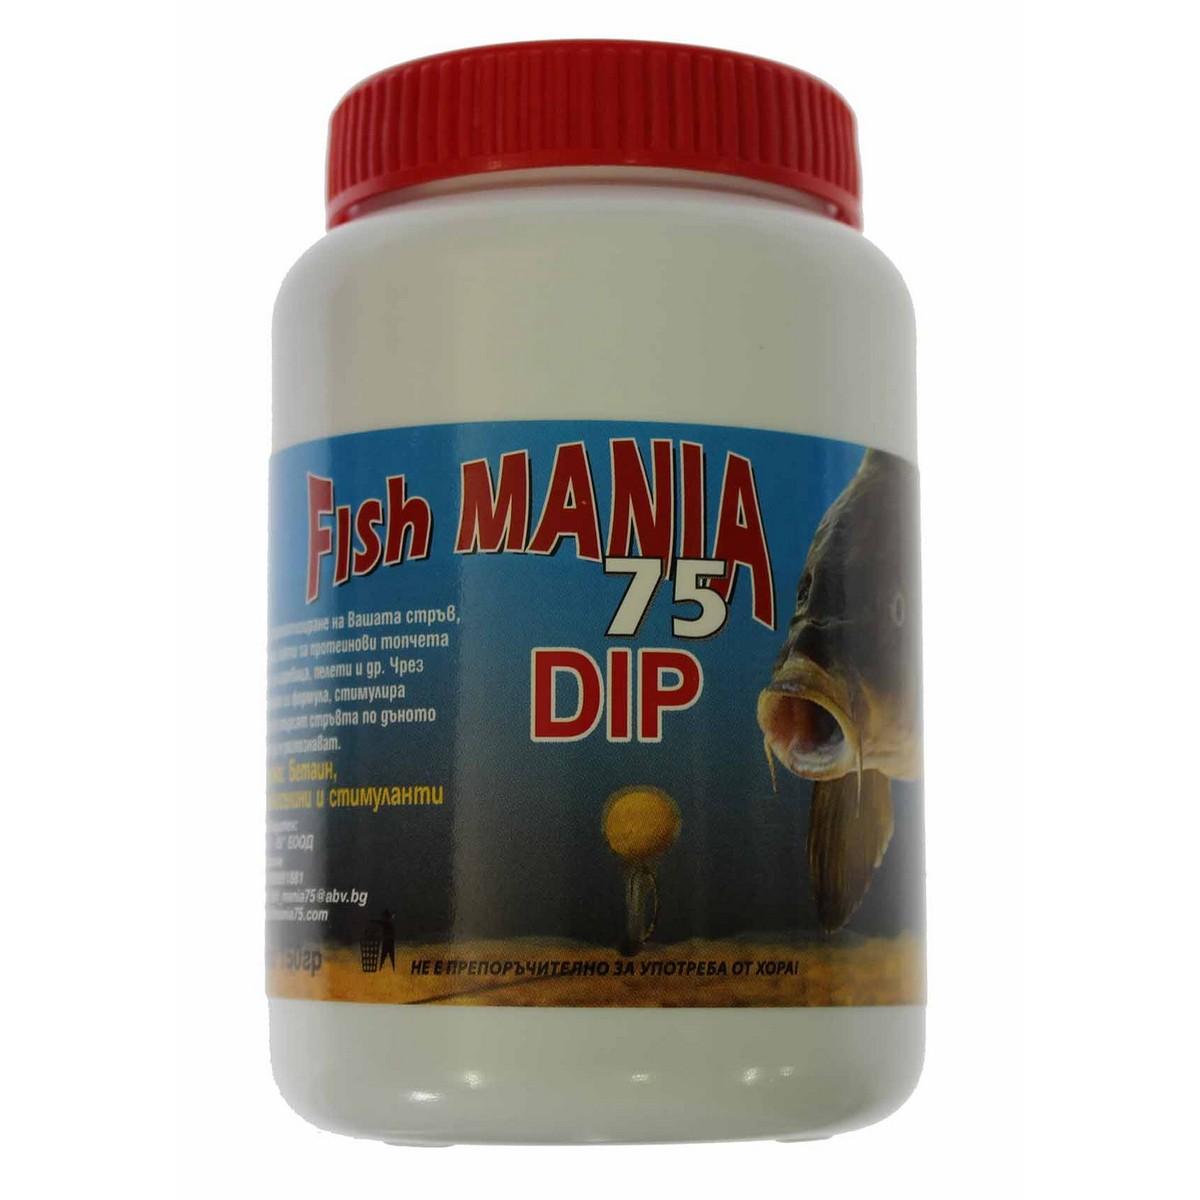 Дип Fish Mania